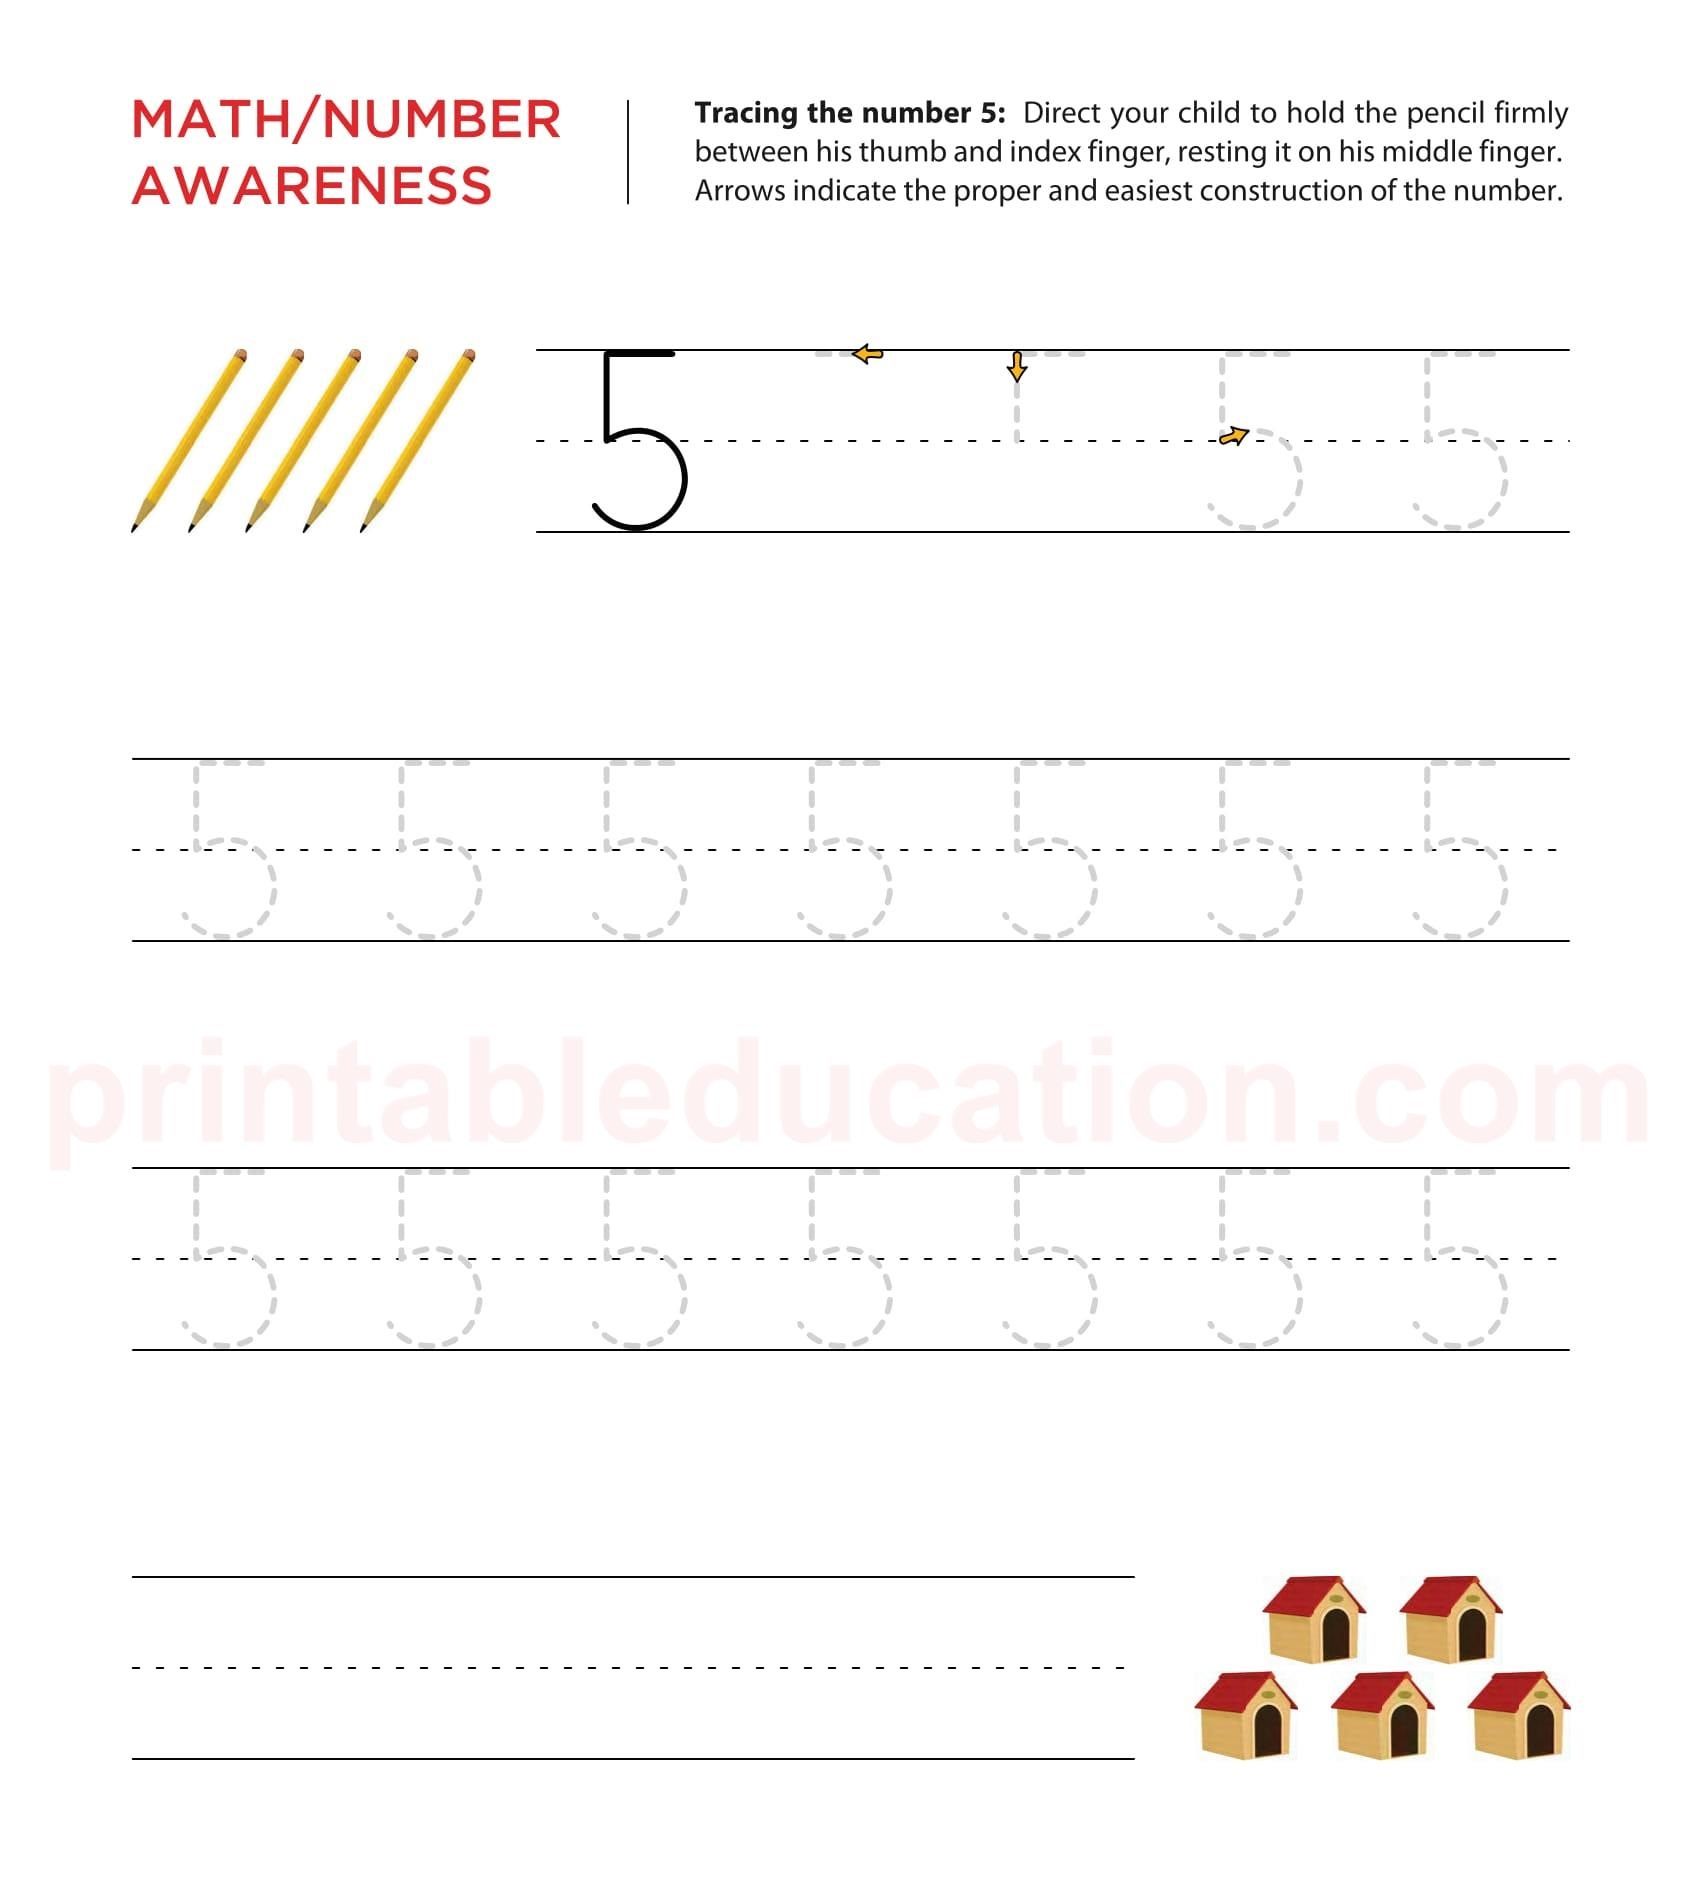 Tracing Number Practice Worksheet